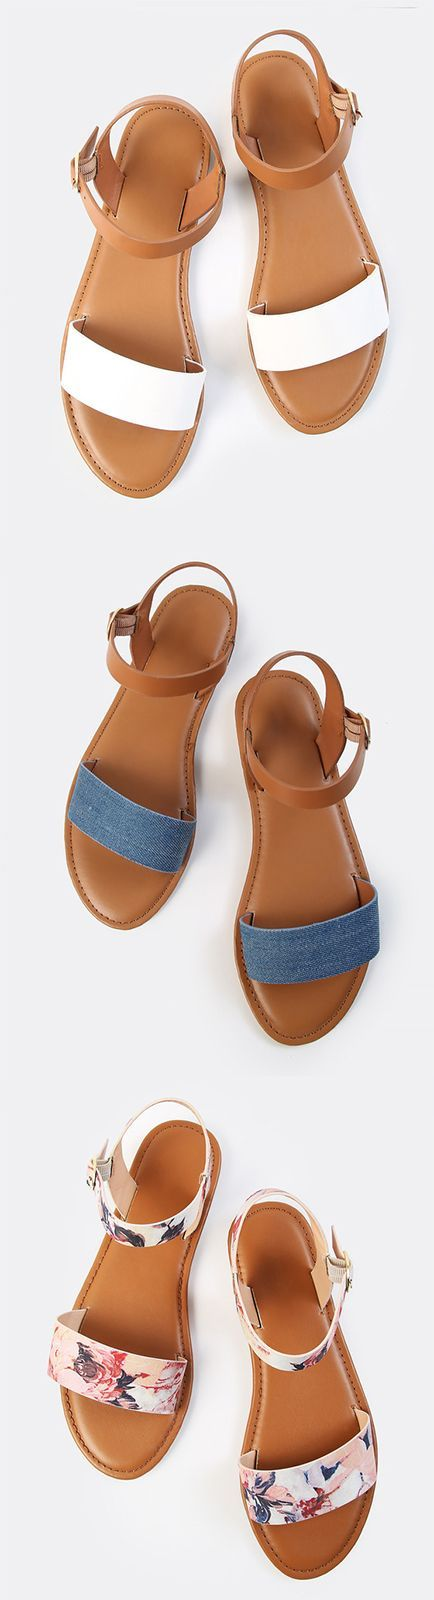 Single Denim Ankle Sandals